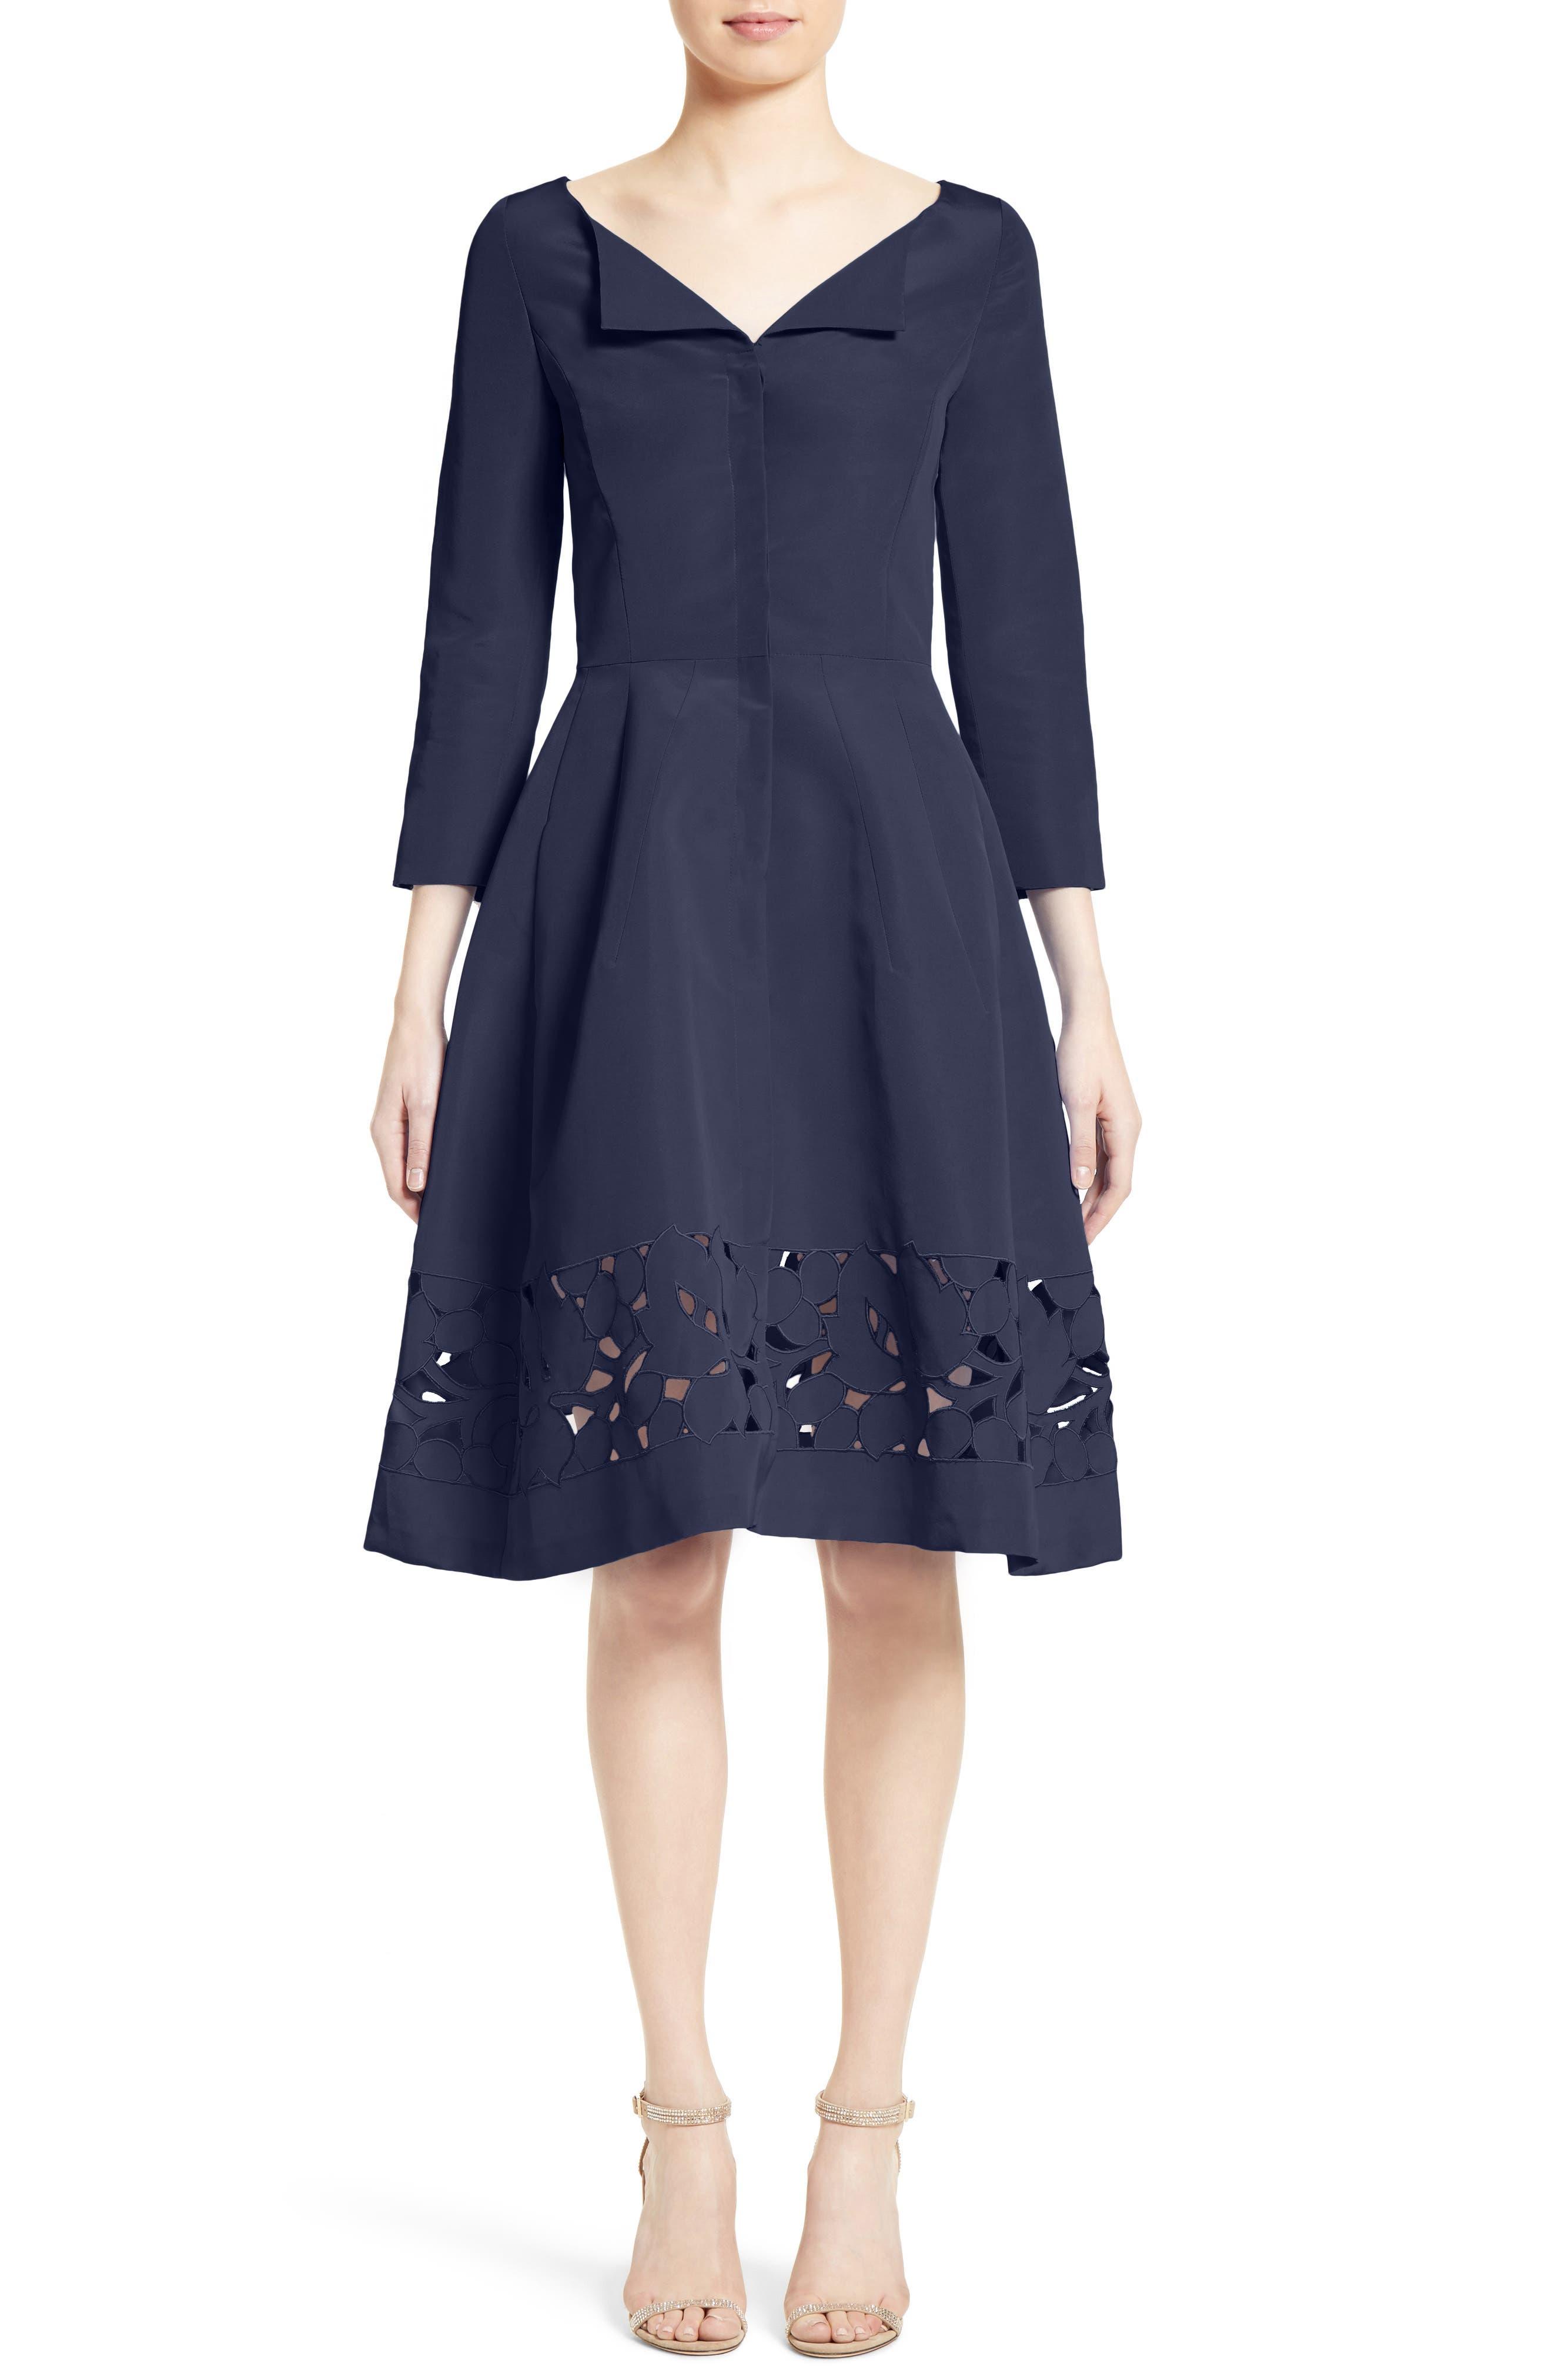 Carolina Herrerra Laser Cut Eyelet Button Front Dress,                         Main,                         color, 400